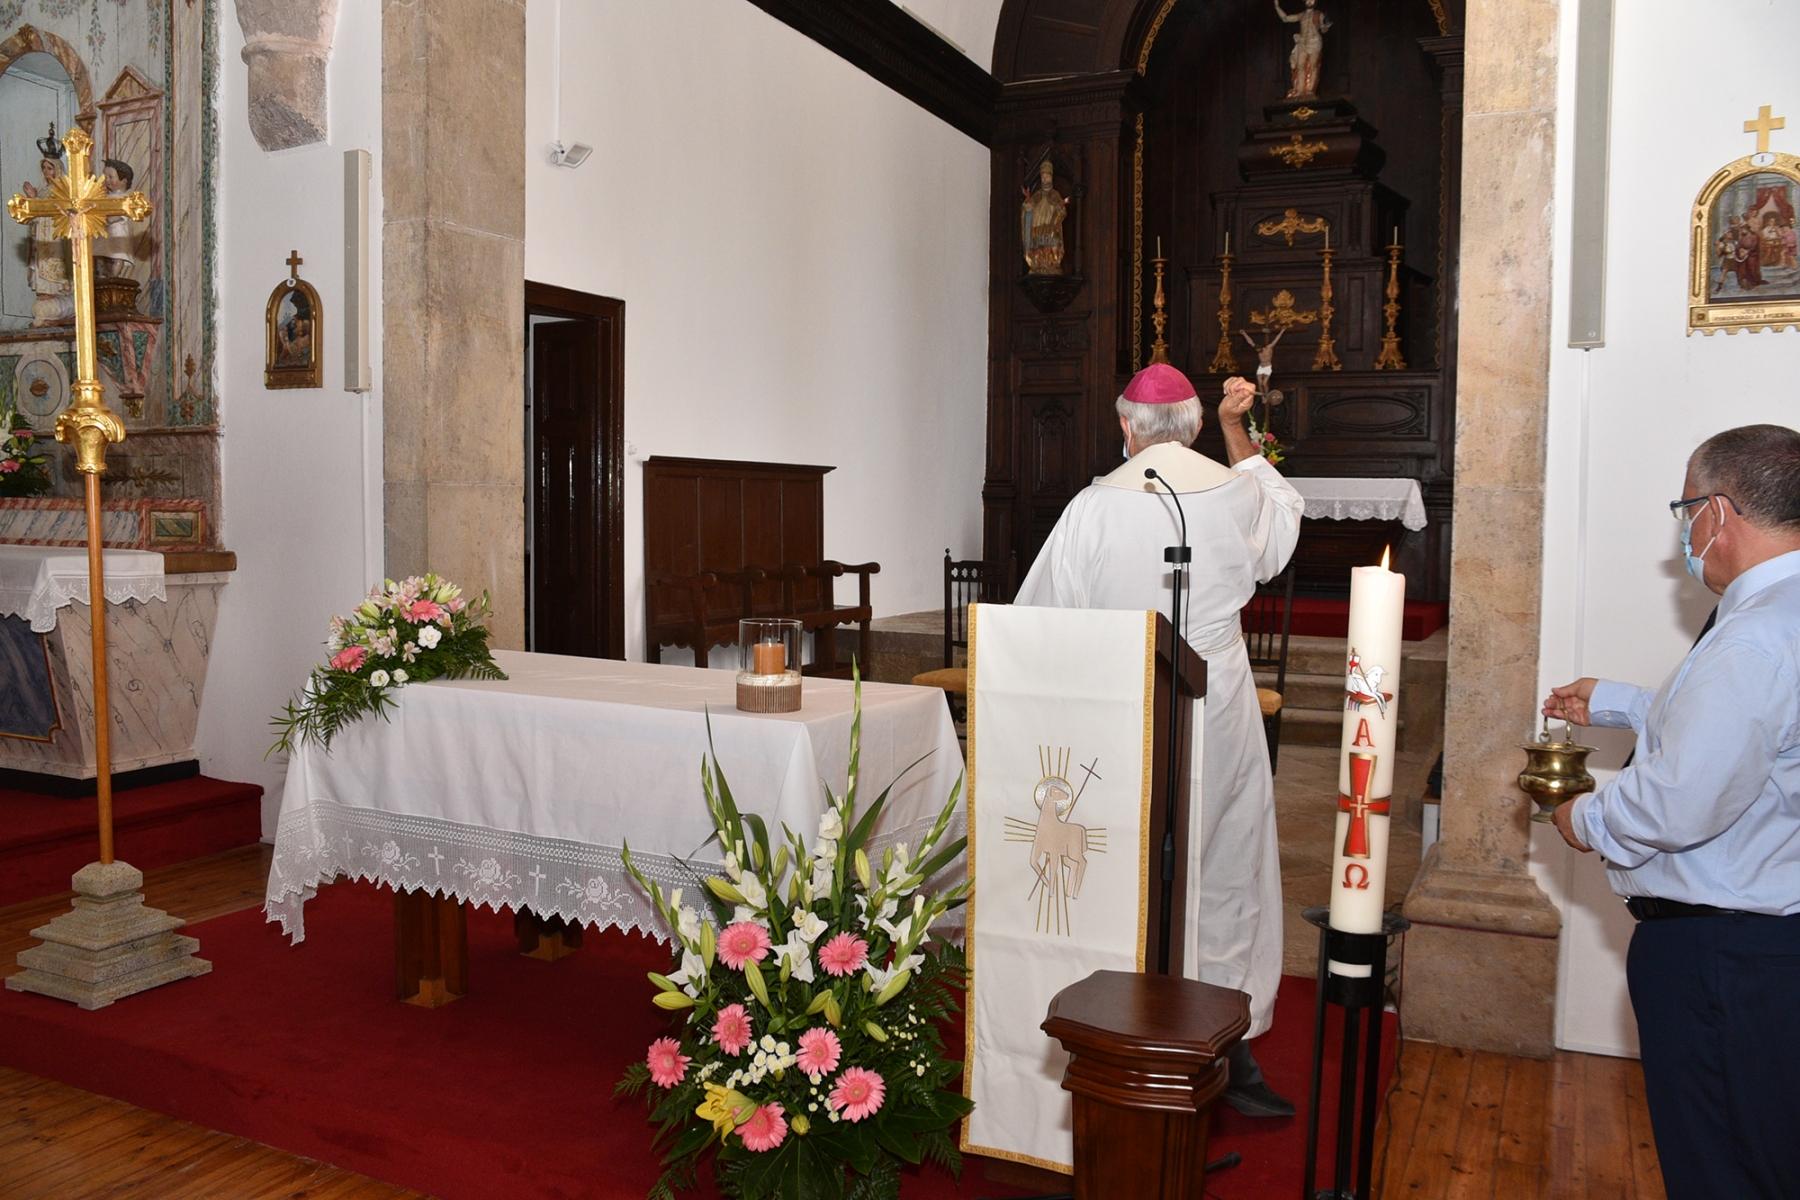 Inauguracao_bencao_obras_restauro_igreja_alcoutim-31